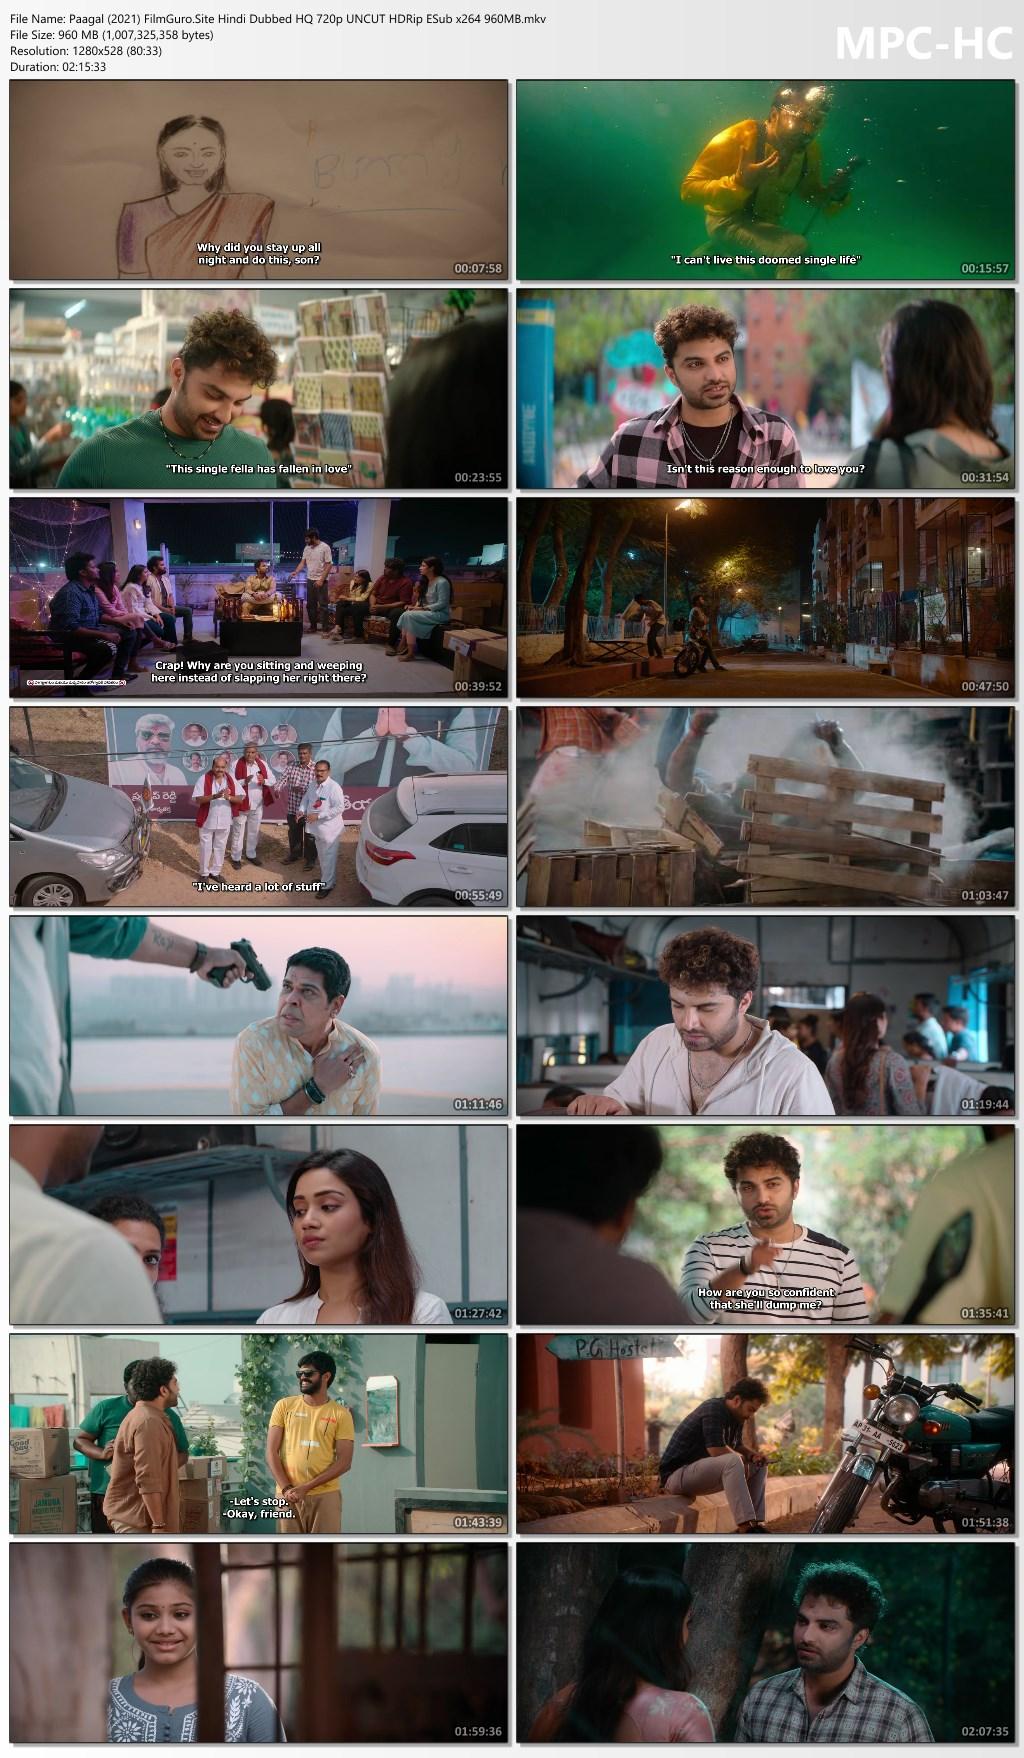 Paagal-2021-Film-Guro-Site-Hindi-Dubbed-HQ-720p-UNCUT-HDRip-ESub-x264-960-MB-mkv-thumbs